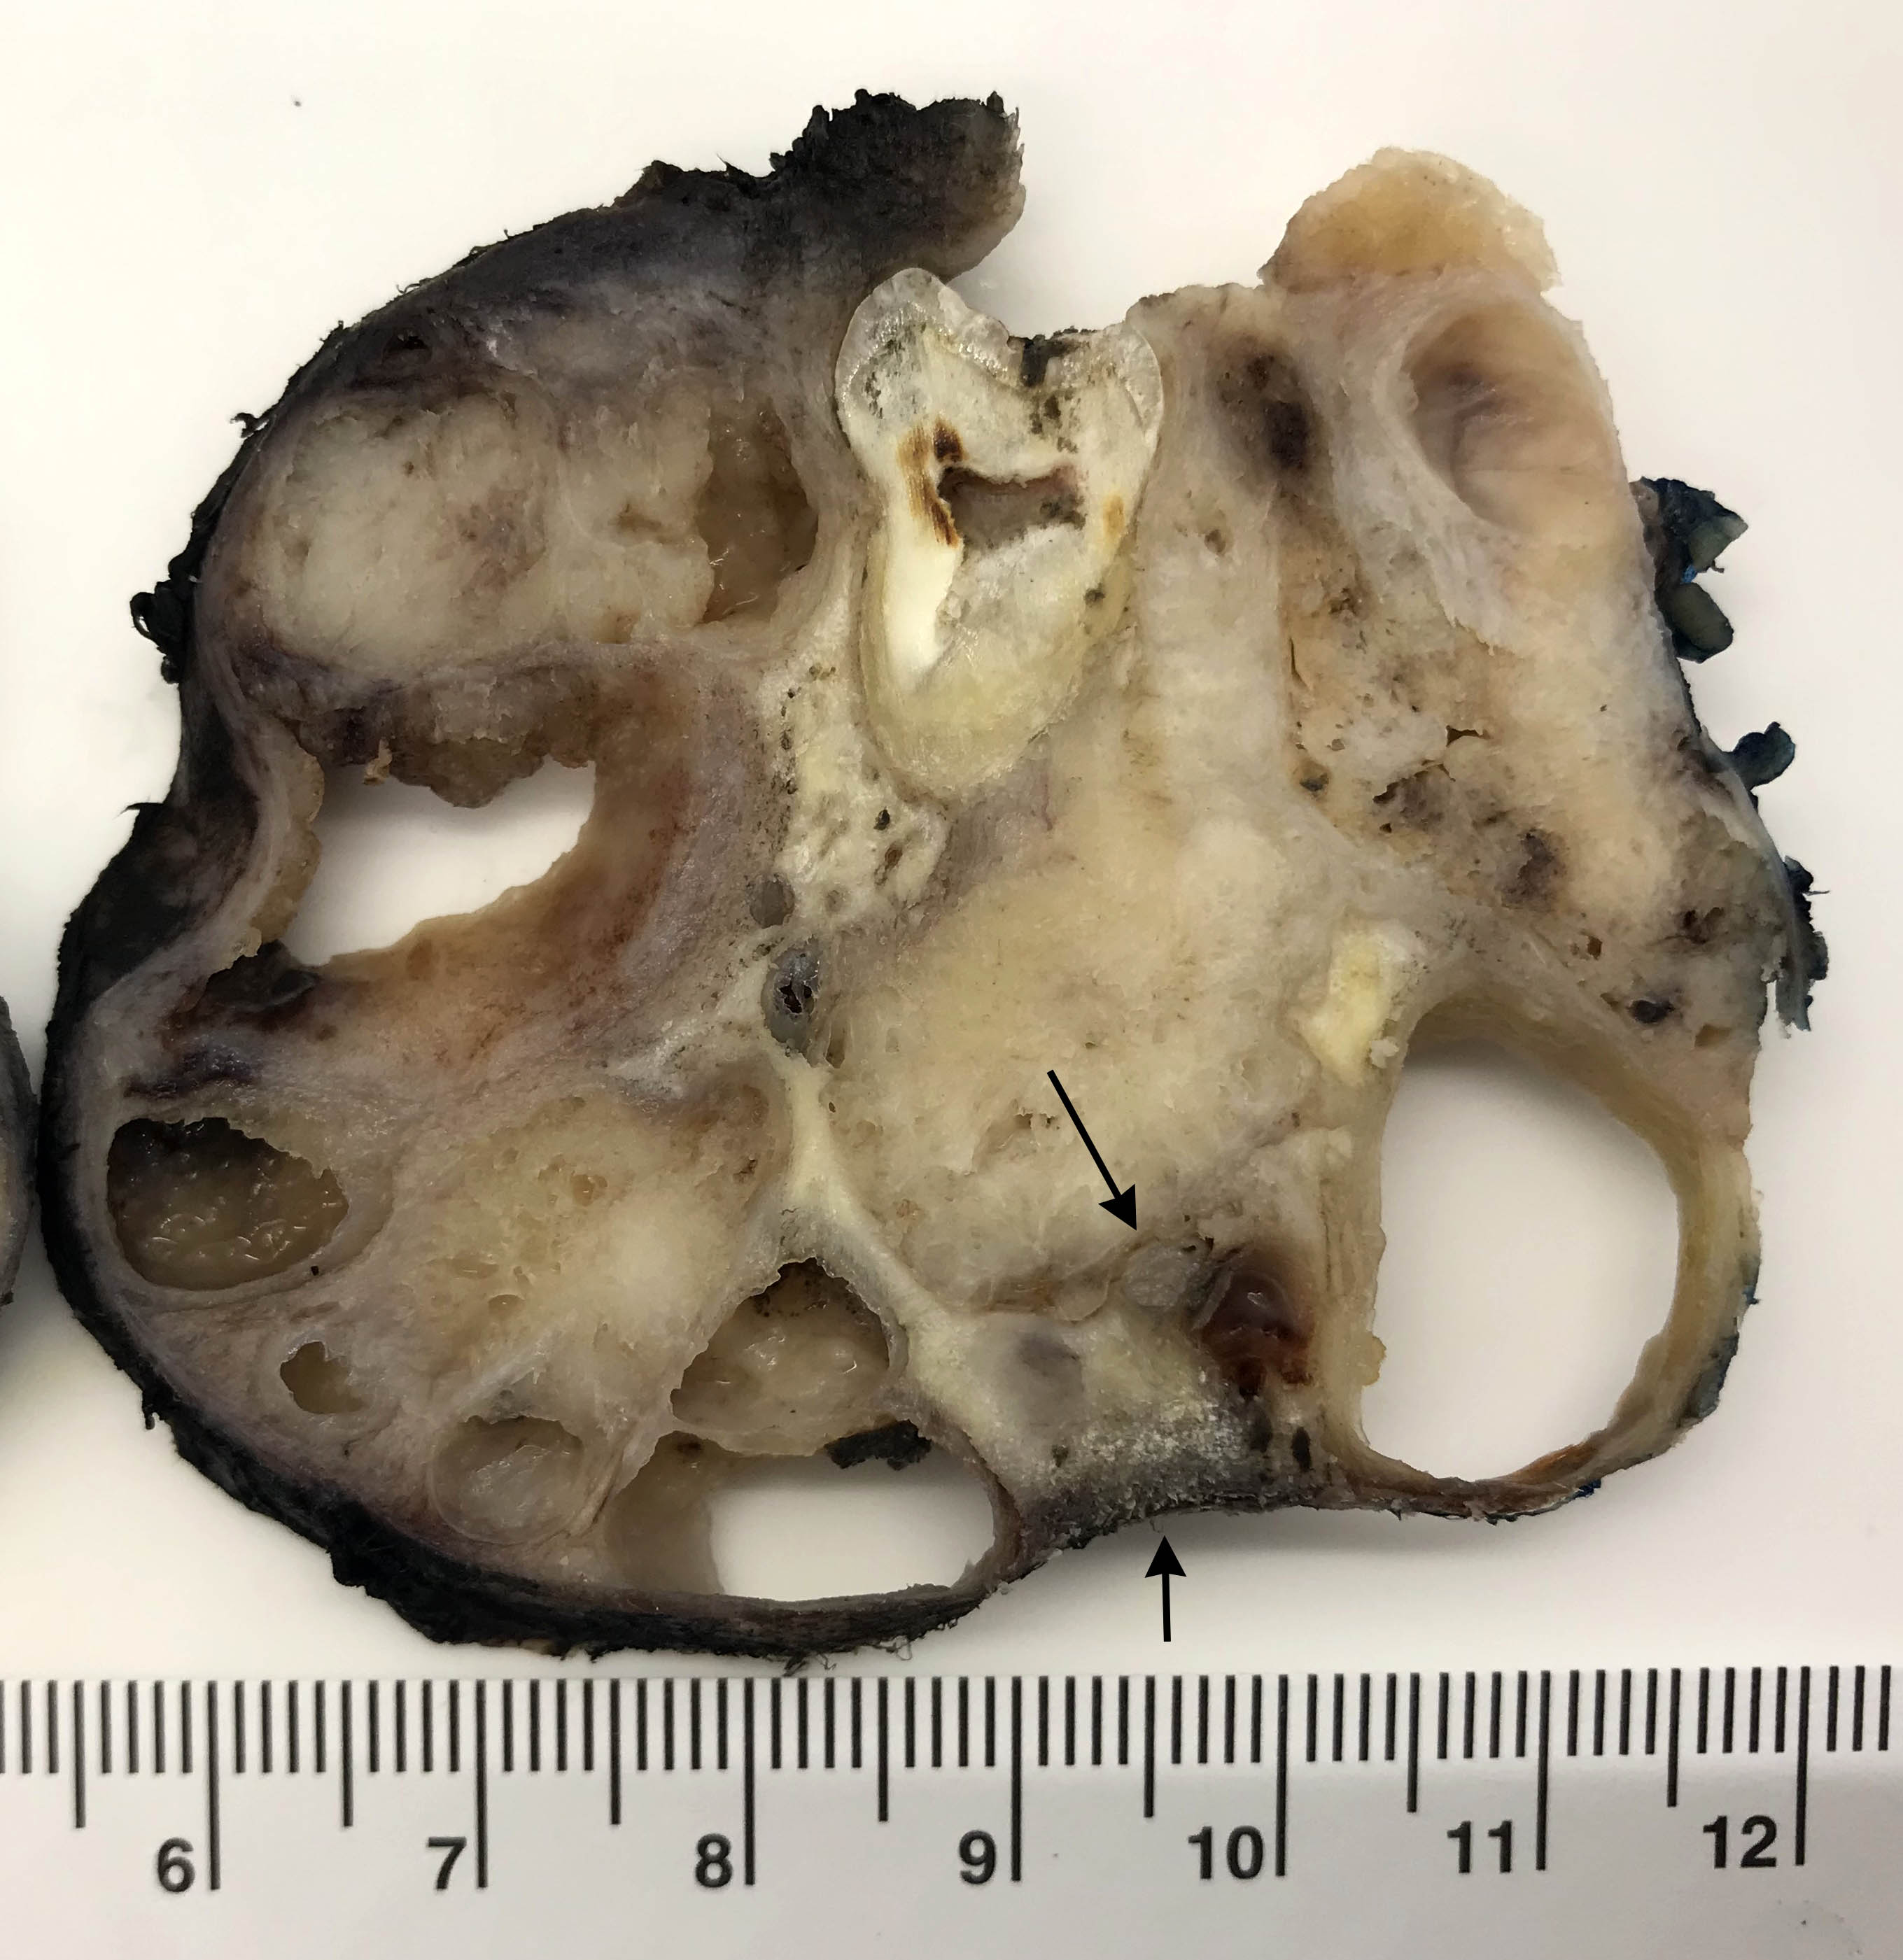 Case 3: Mandibular ameloblastoma